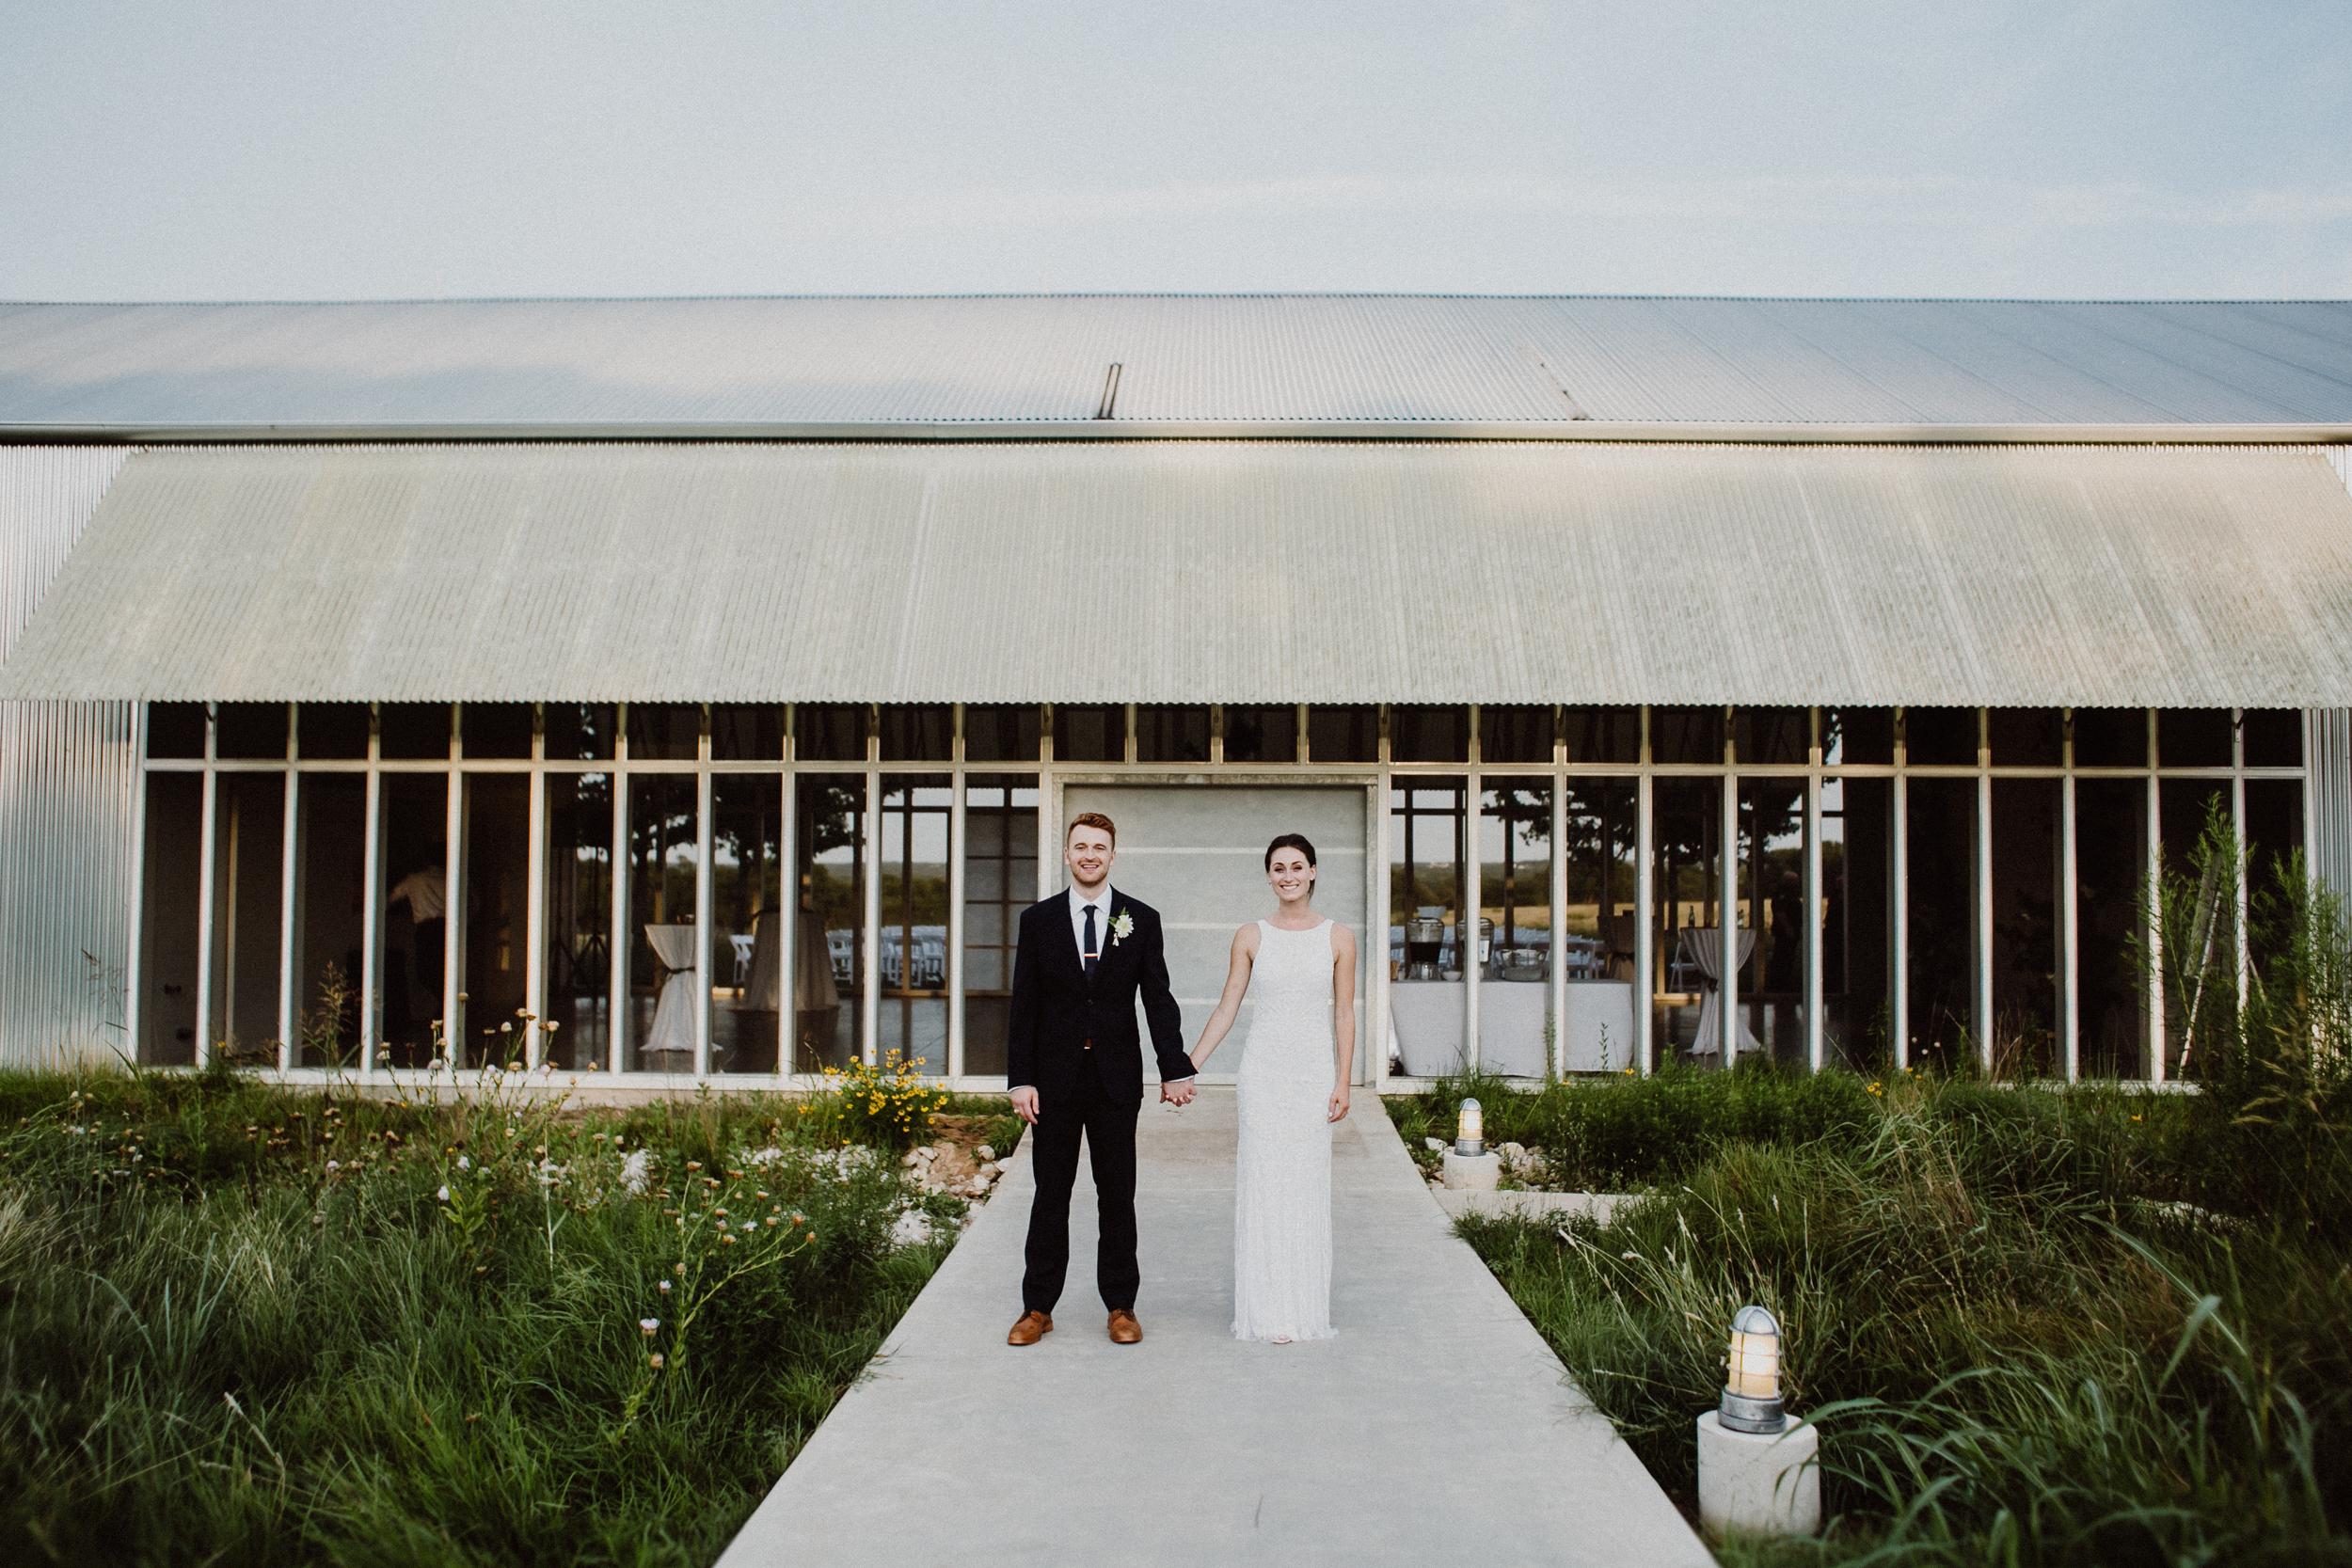 prospect-house-wedding-S&AC-844.jpg